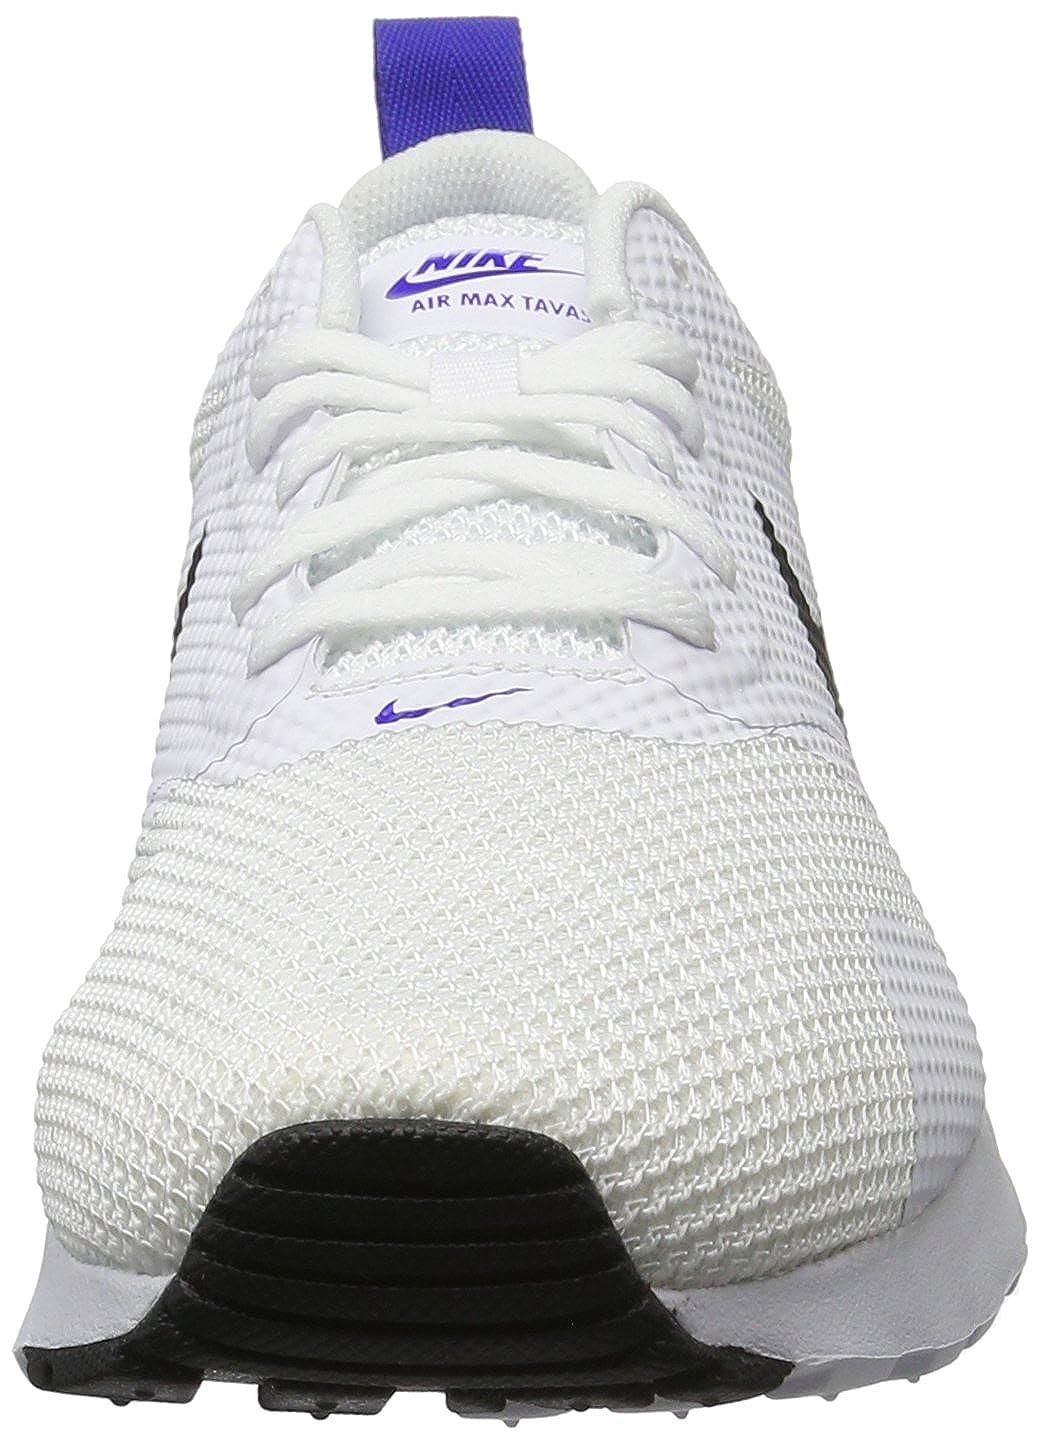 best website 92afb 7d40b Amazon.com   Nike Men s Air Max Tavas Running Shoes   Road Running